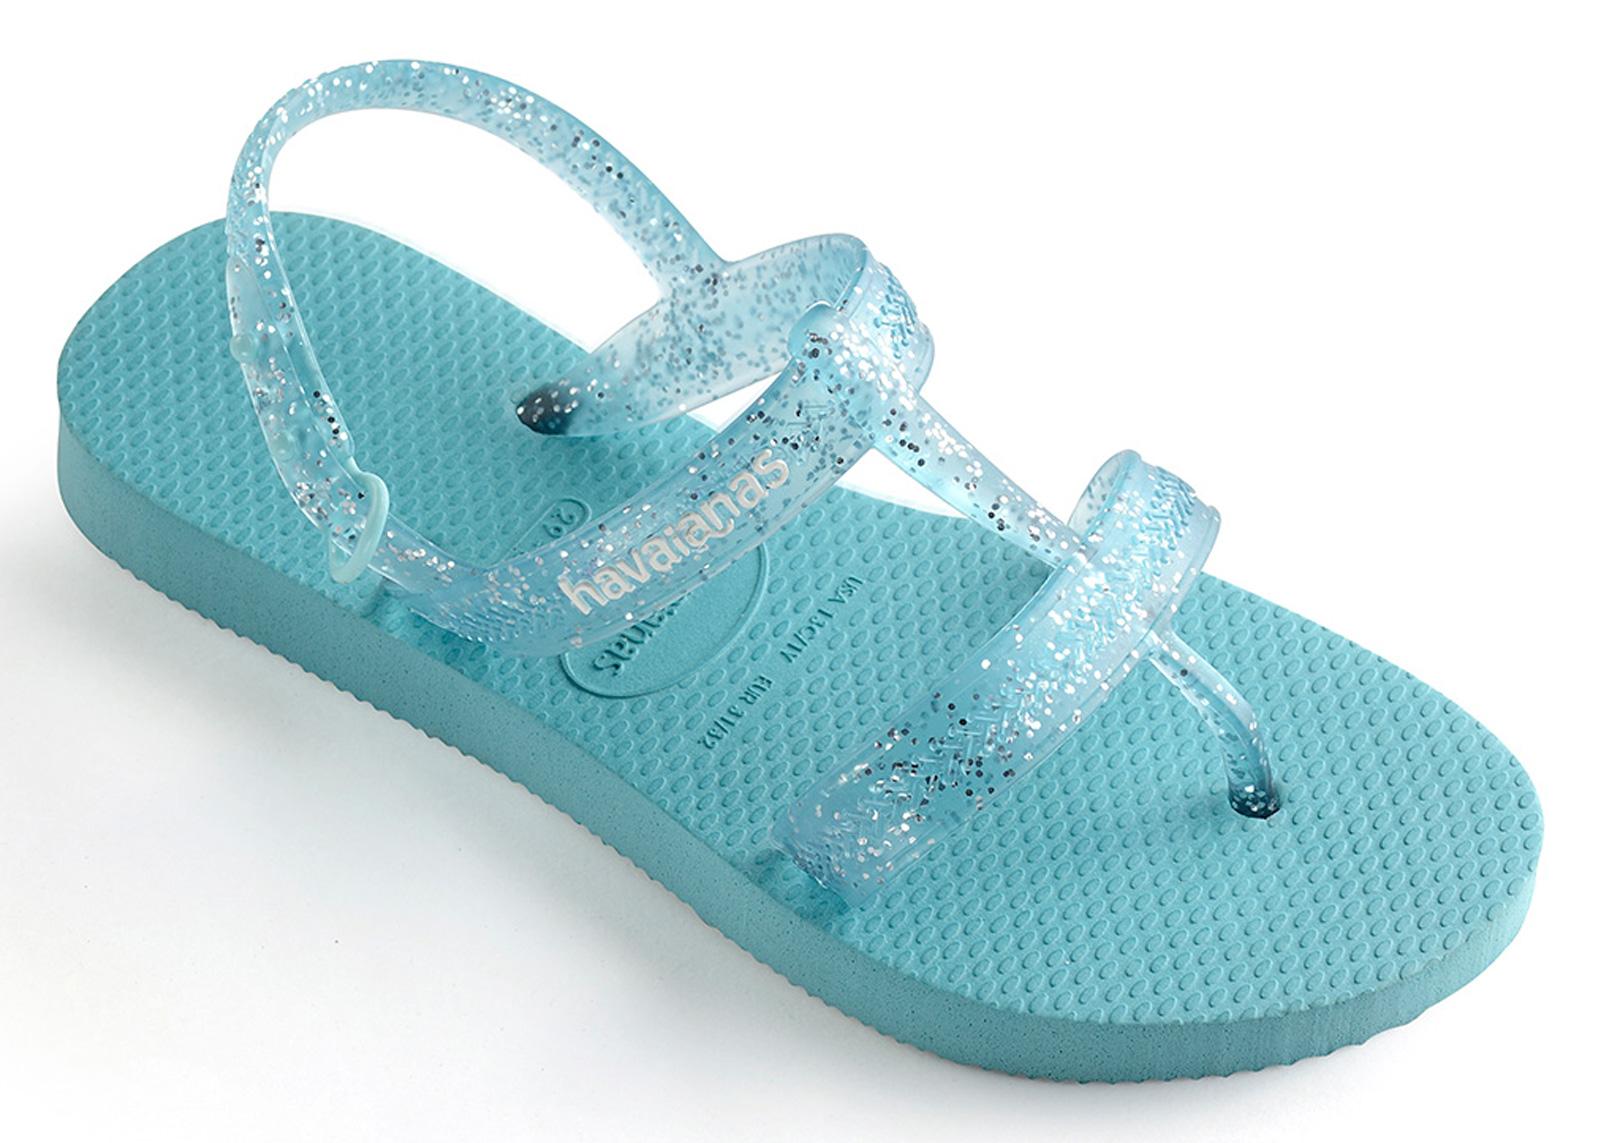 d8ba03ba3ceab7 Flip-Flops Kids Joy Blue - Brand Havaianas